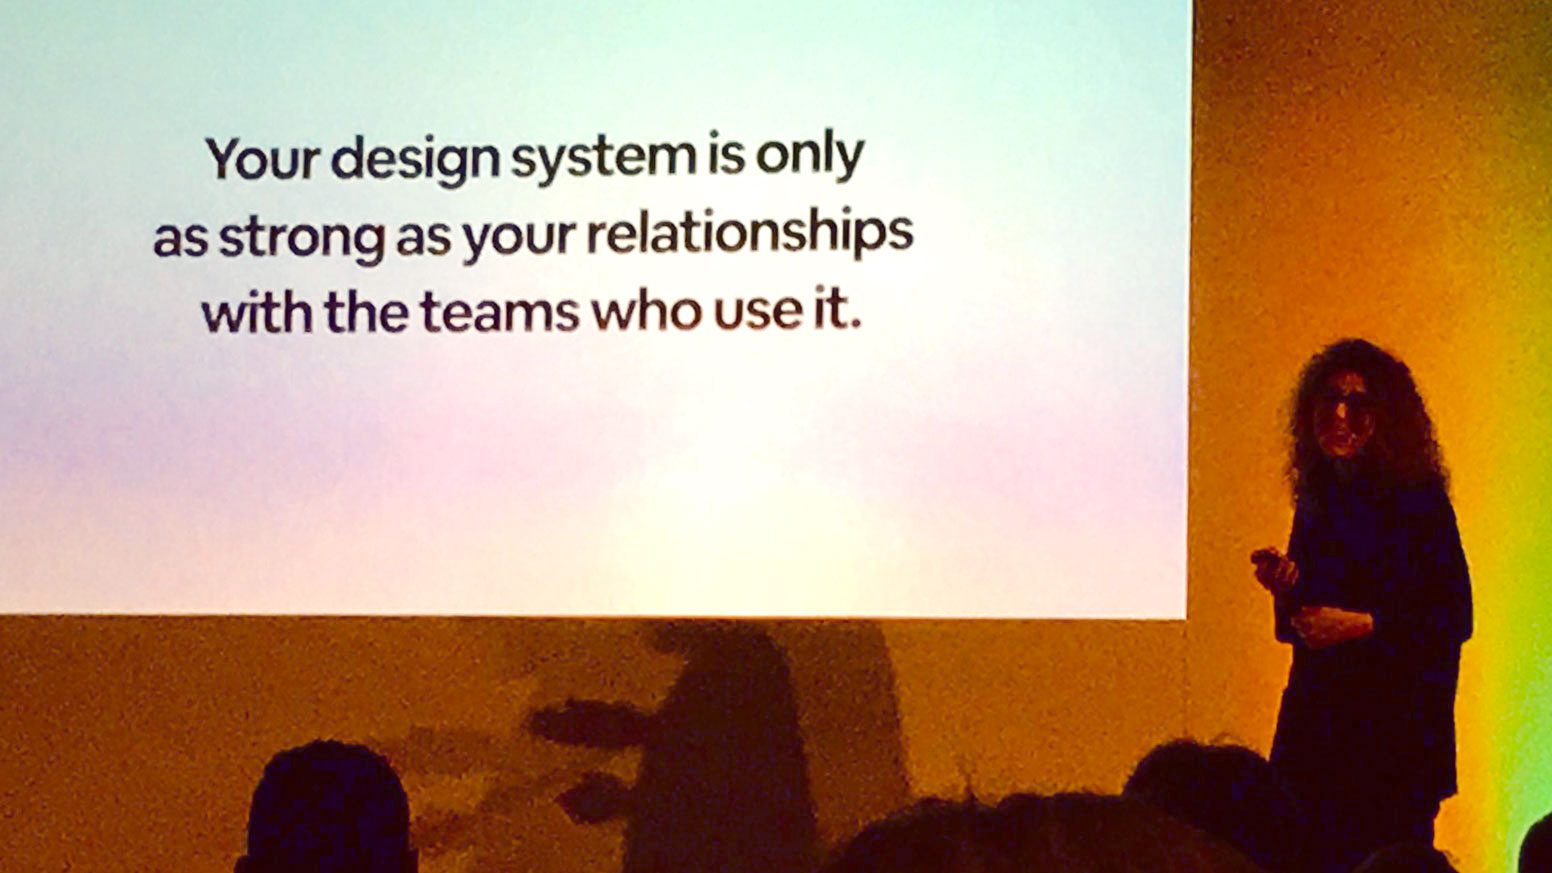 Design is relationships